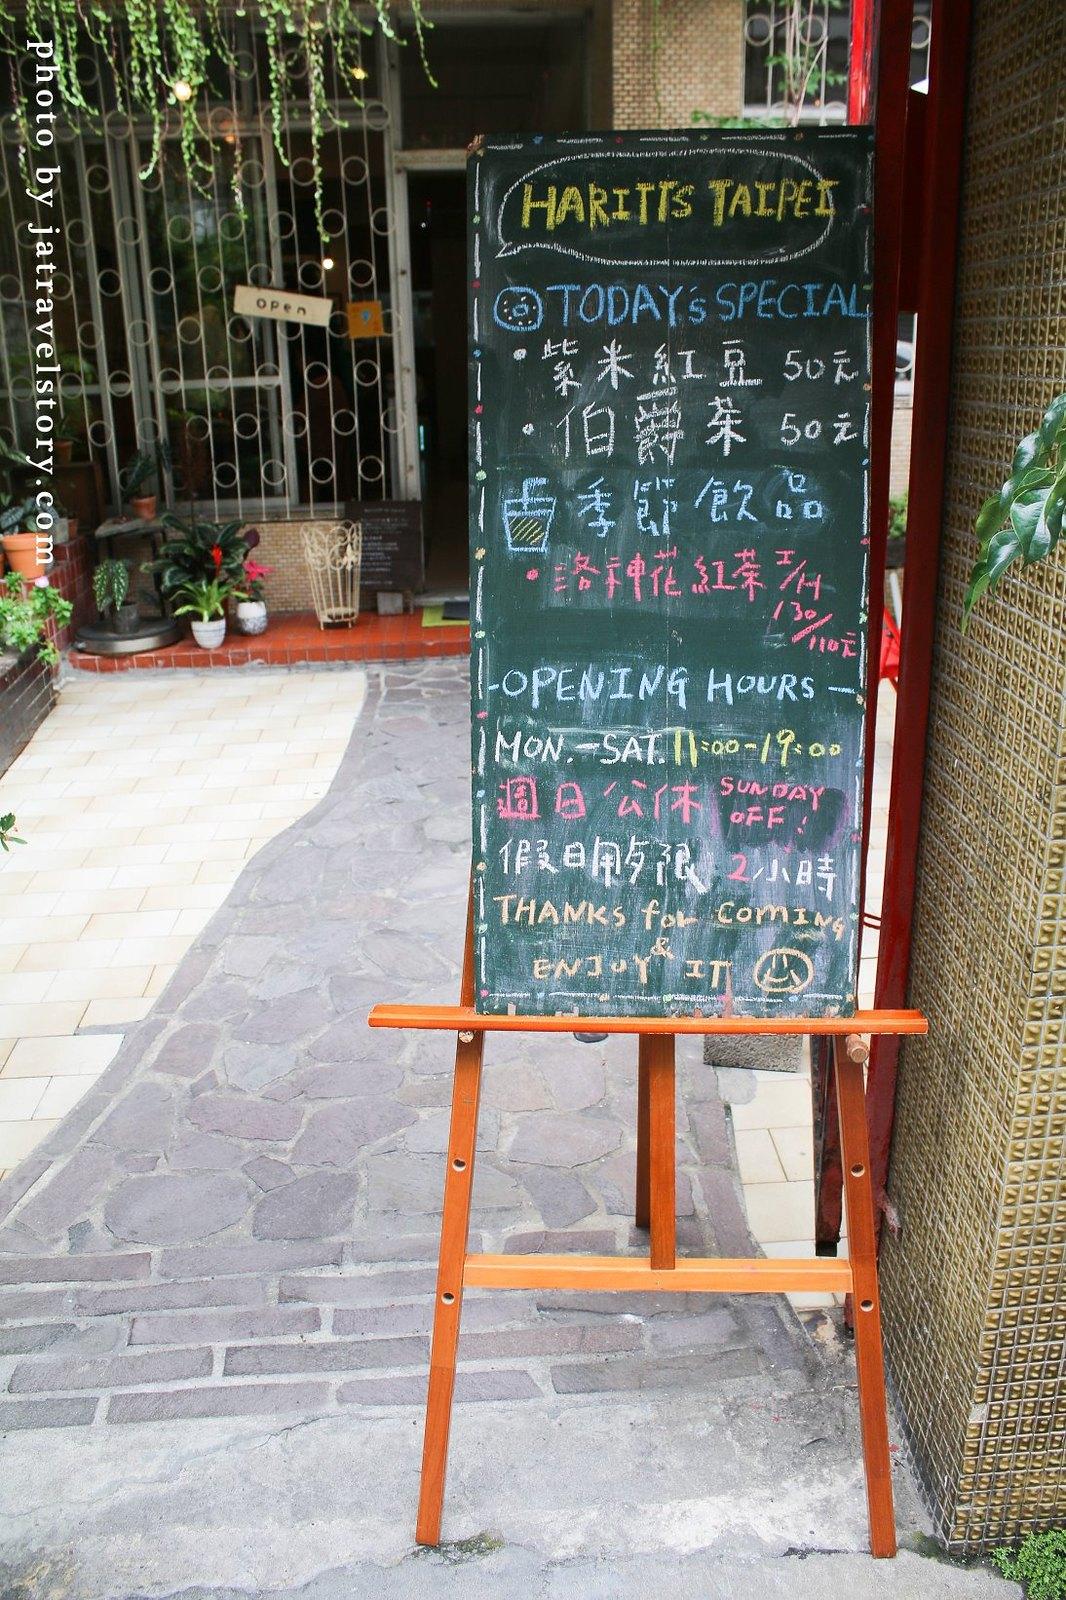 Haritts 甜甜圈 來自日本東京的甜甜圈,抹茶微苦甘甜、口感鬆軟!【捷運南京復興】 @J&A的旅行